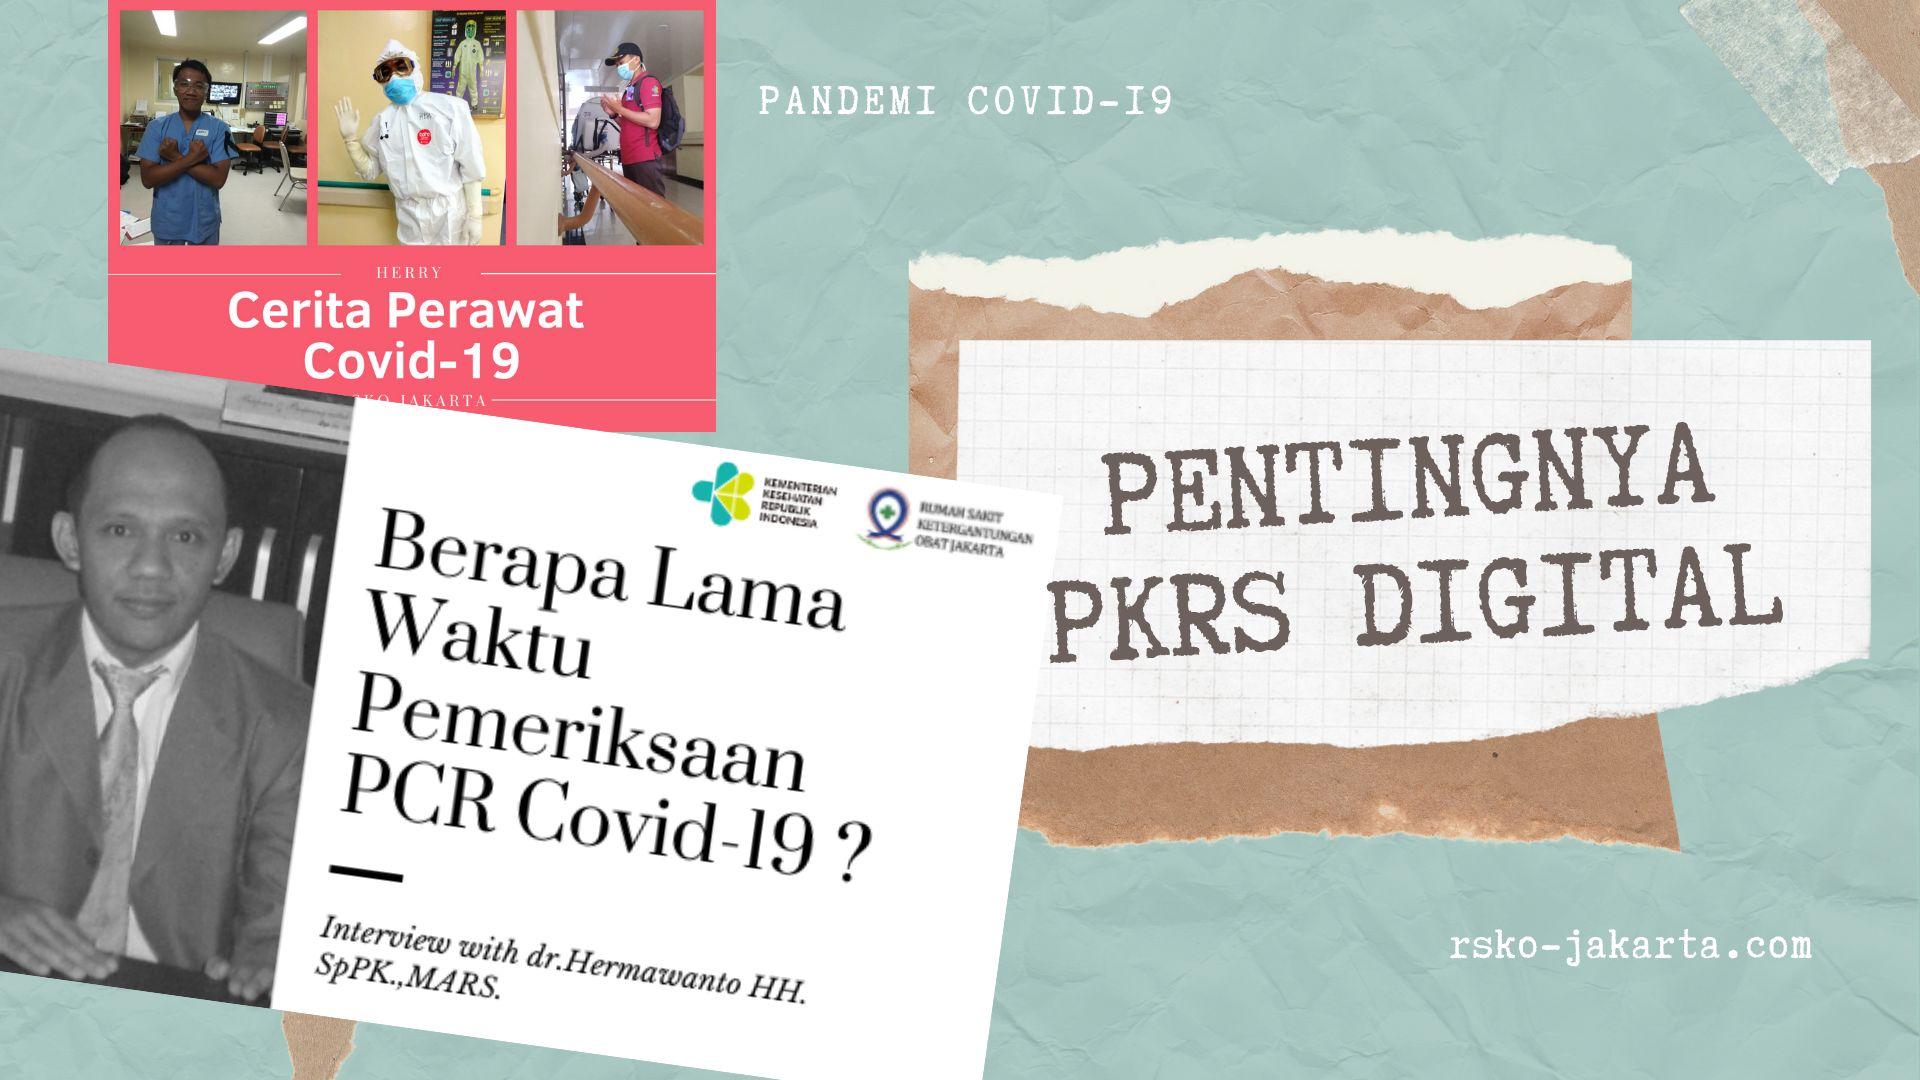 Deskripsi : PKRS Digital di masa Pandemi Covid-19 I Sumber Foto : dokpri